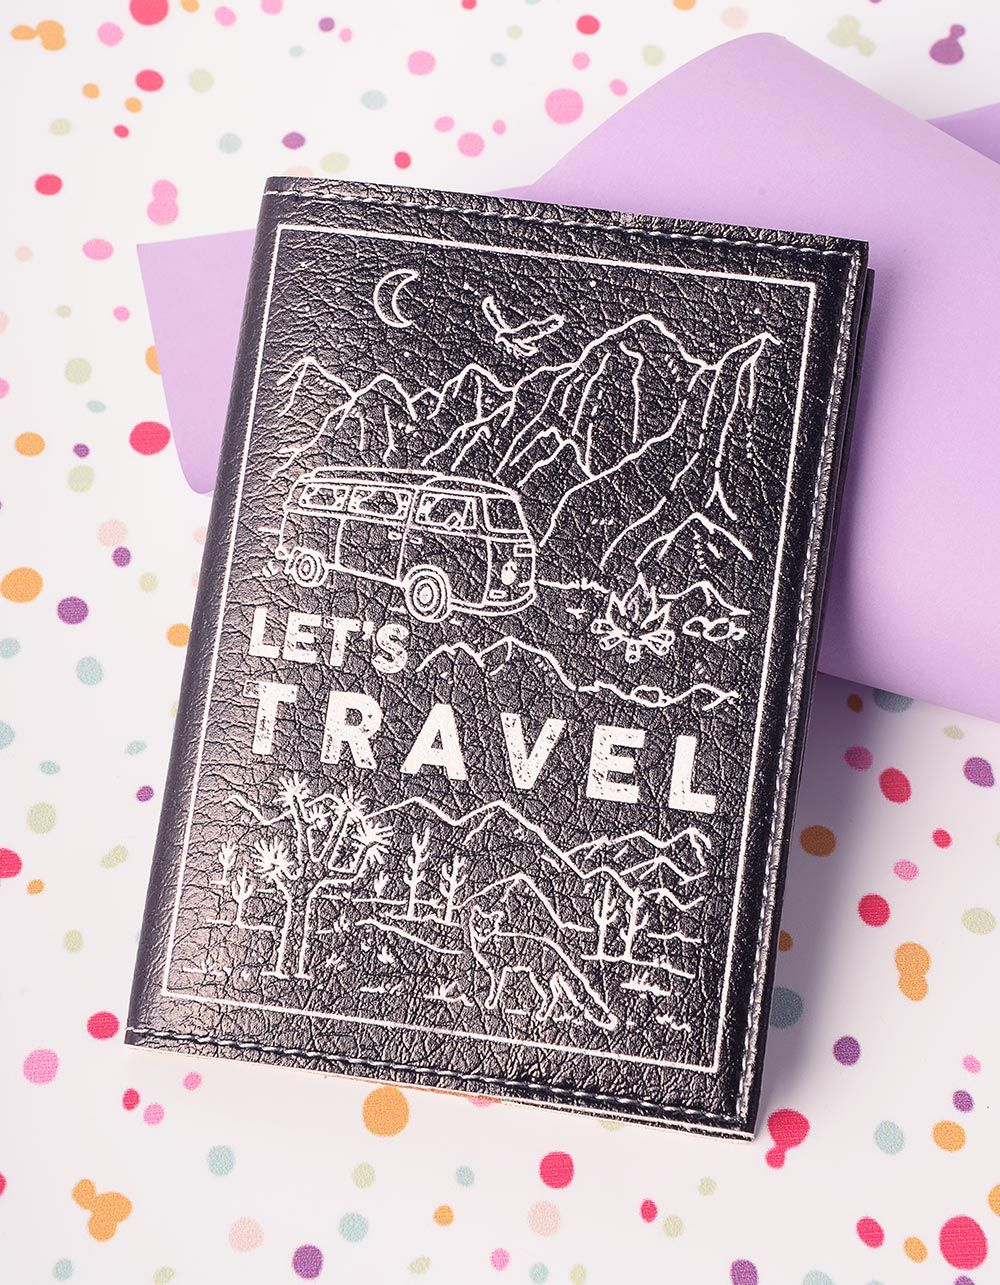 Обкладинка на паспорт з написом lets travel | 221337-02-XX